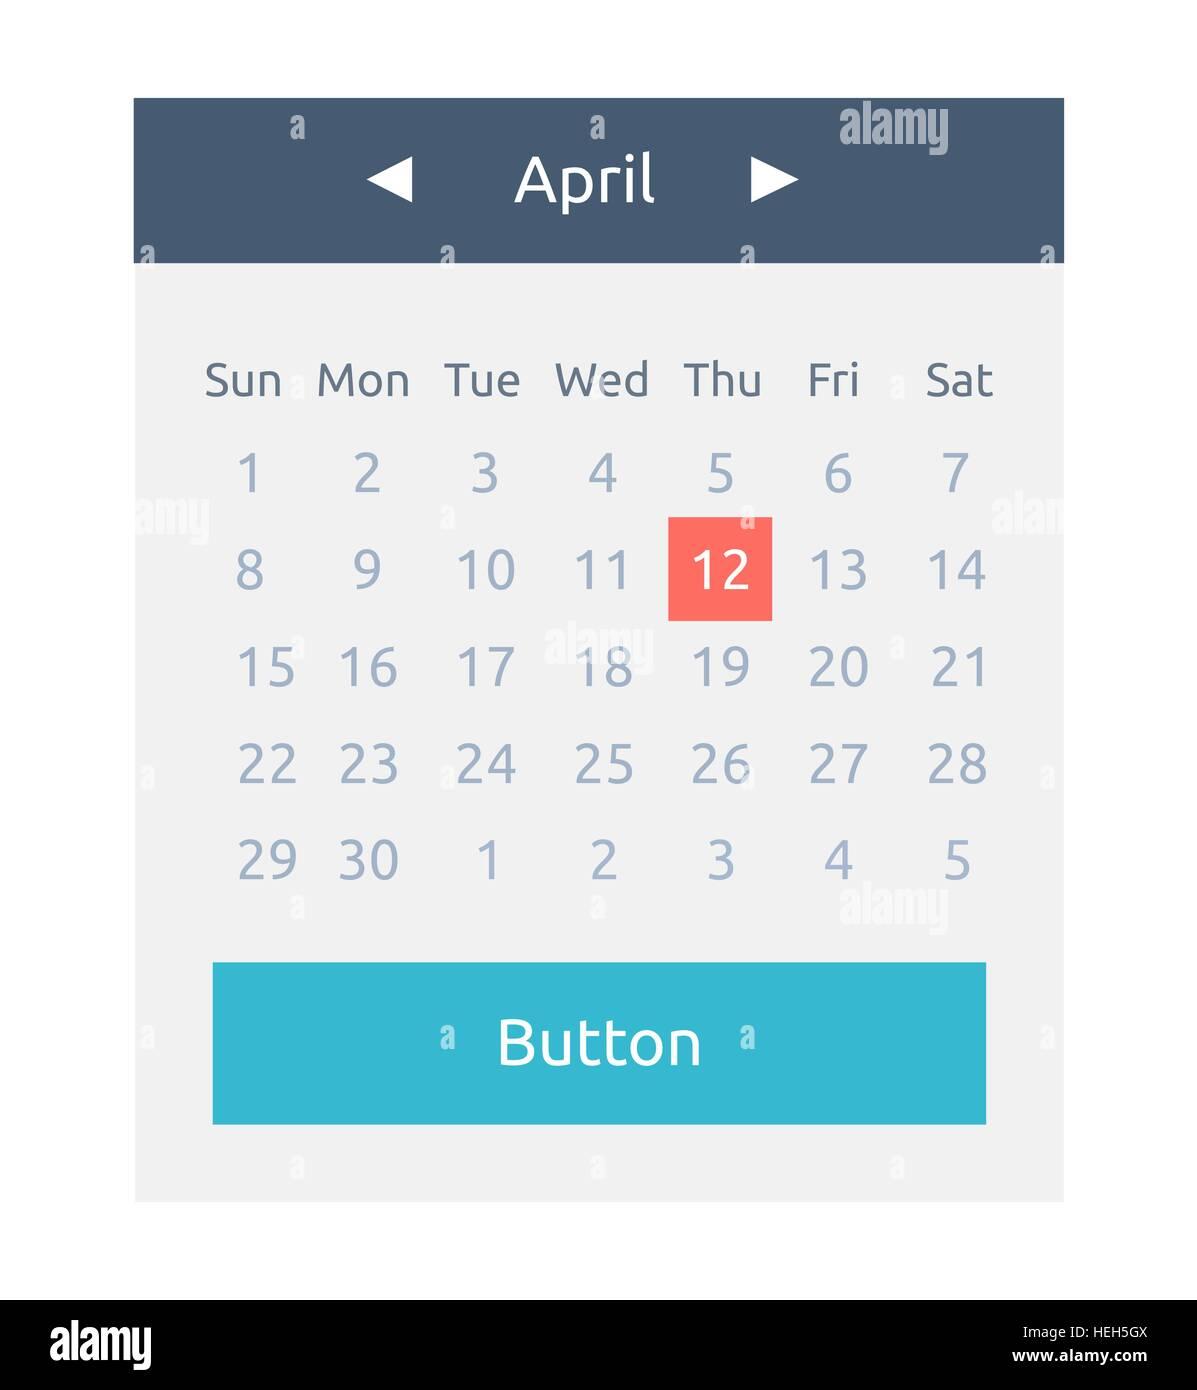 Calendario Per Sito Web.Elemento Del Sito Web Pulsante Calendario Icona Calendario